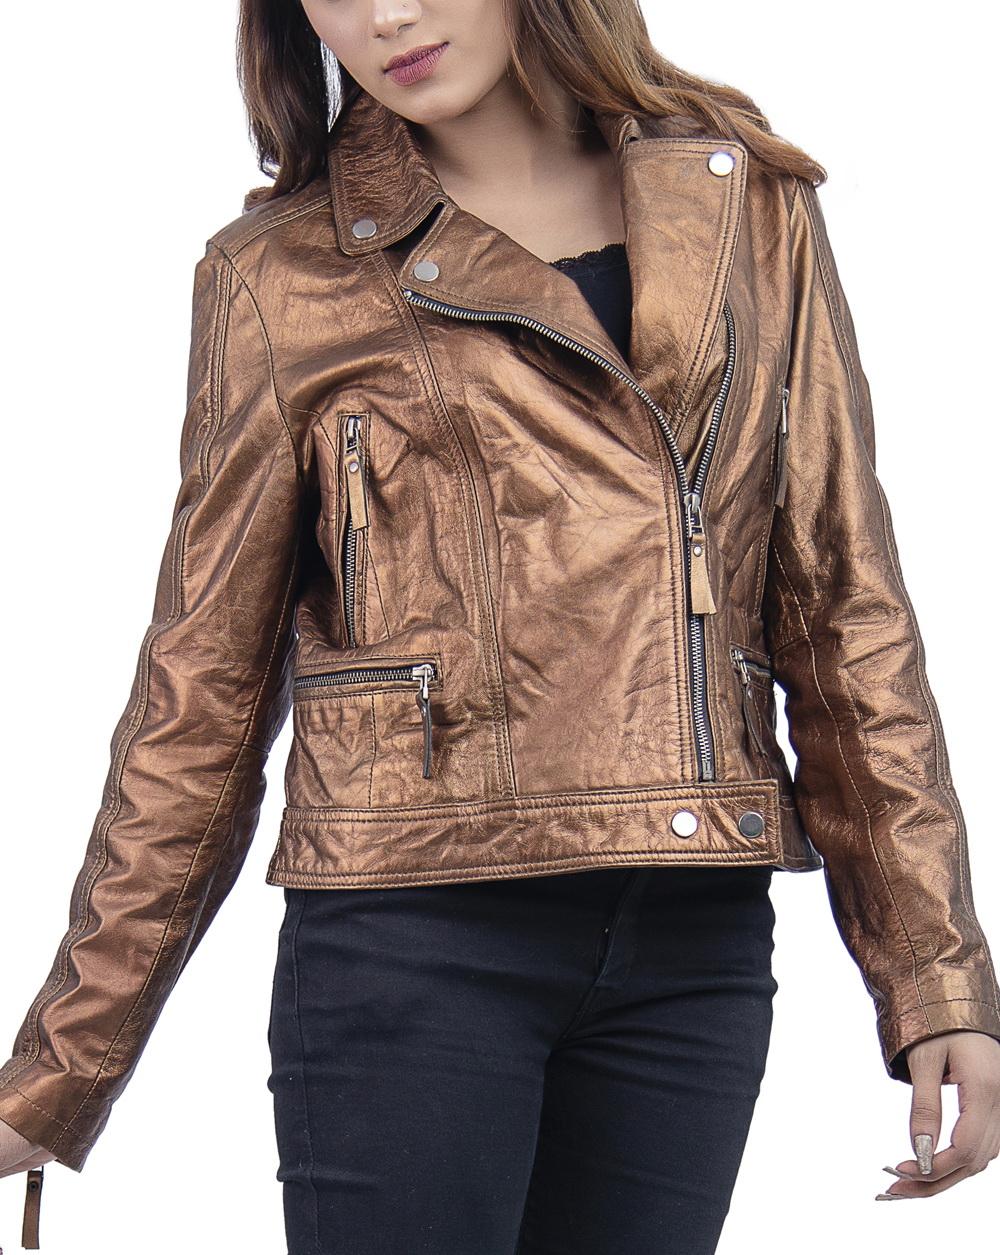 copper-metalic-jacket.jpg (800×1004)